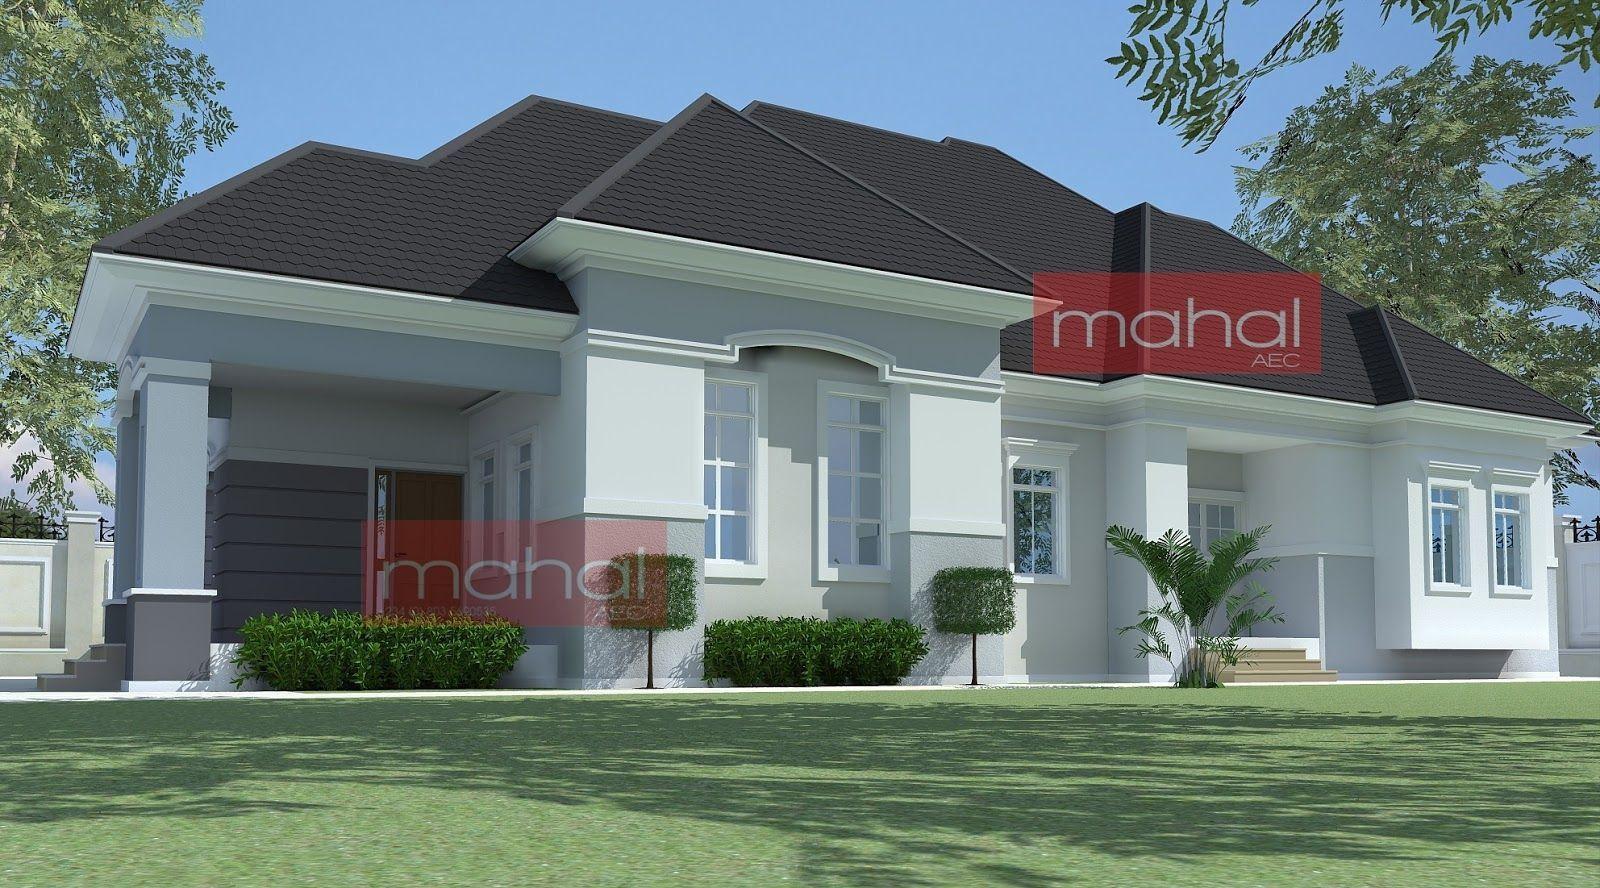 Illustrate Home Designs 4 Bedroom Bungalow Plan In Nigeria 4 Bedroom Bungalow Modern Roof Design House Roof Design Bungalow House Plans